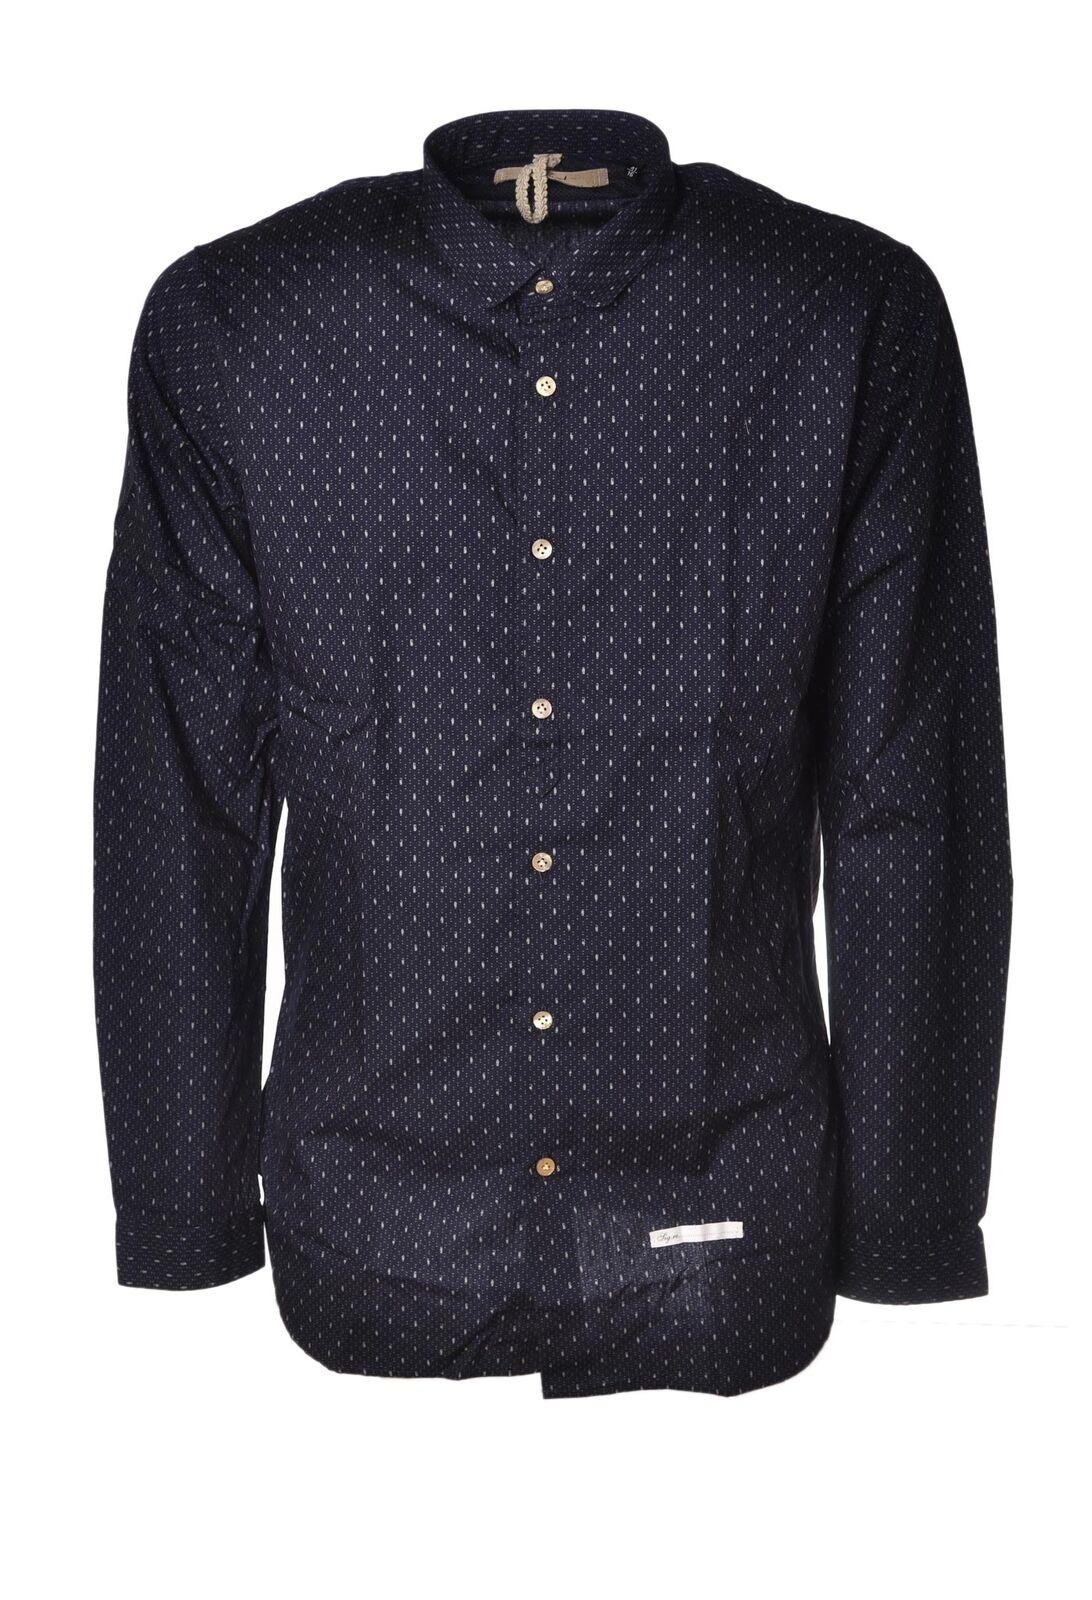 Dnl - Shirts-Shirts - Man - Blau - 4358911H184046